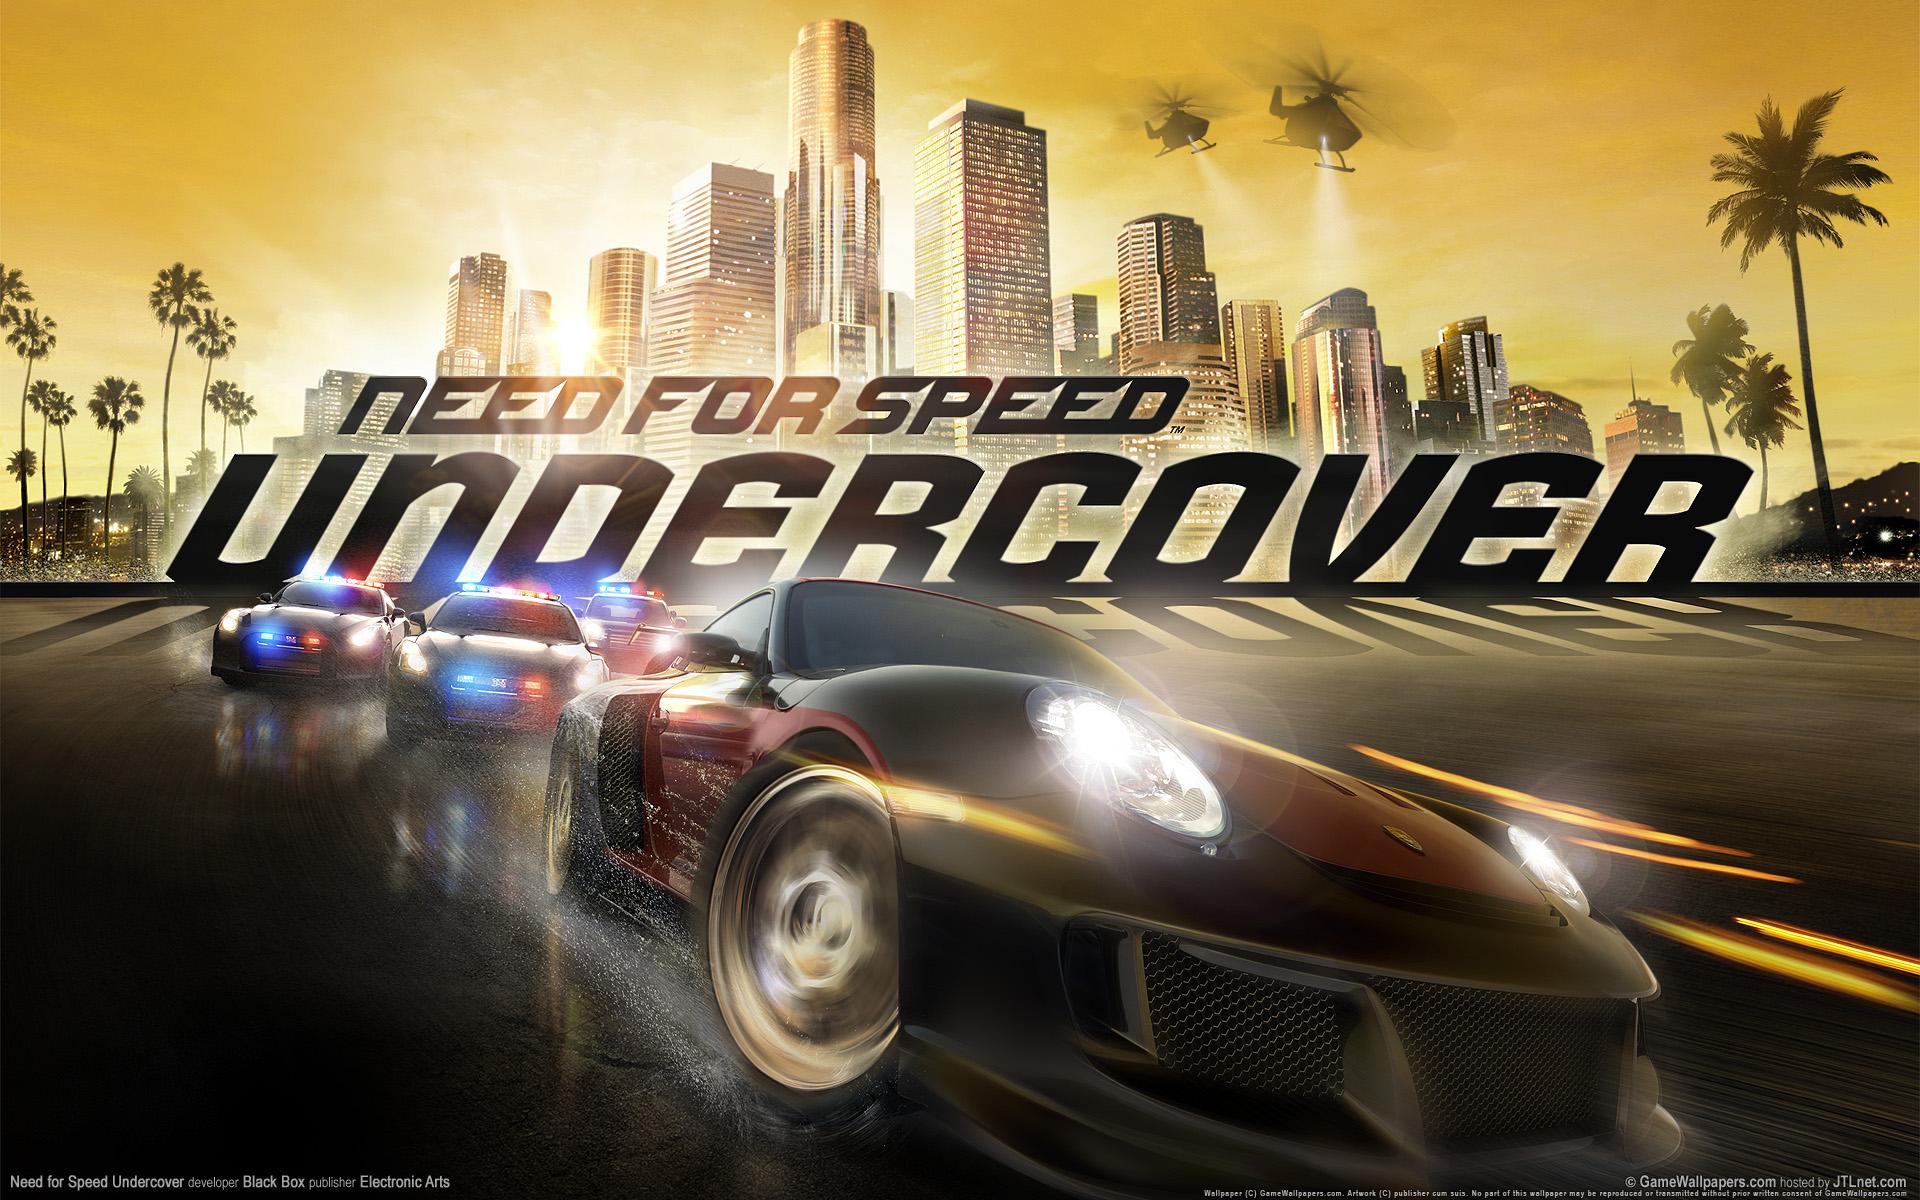 Скачать картинку бесплатно Need for Speed Undercover, game, pc games